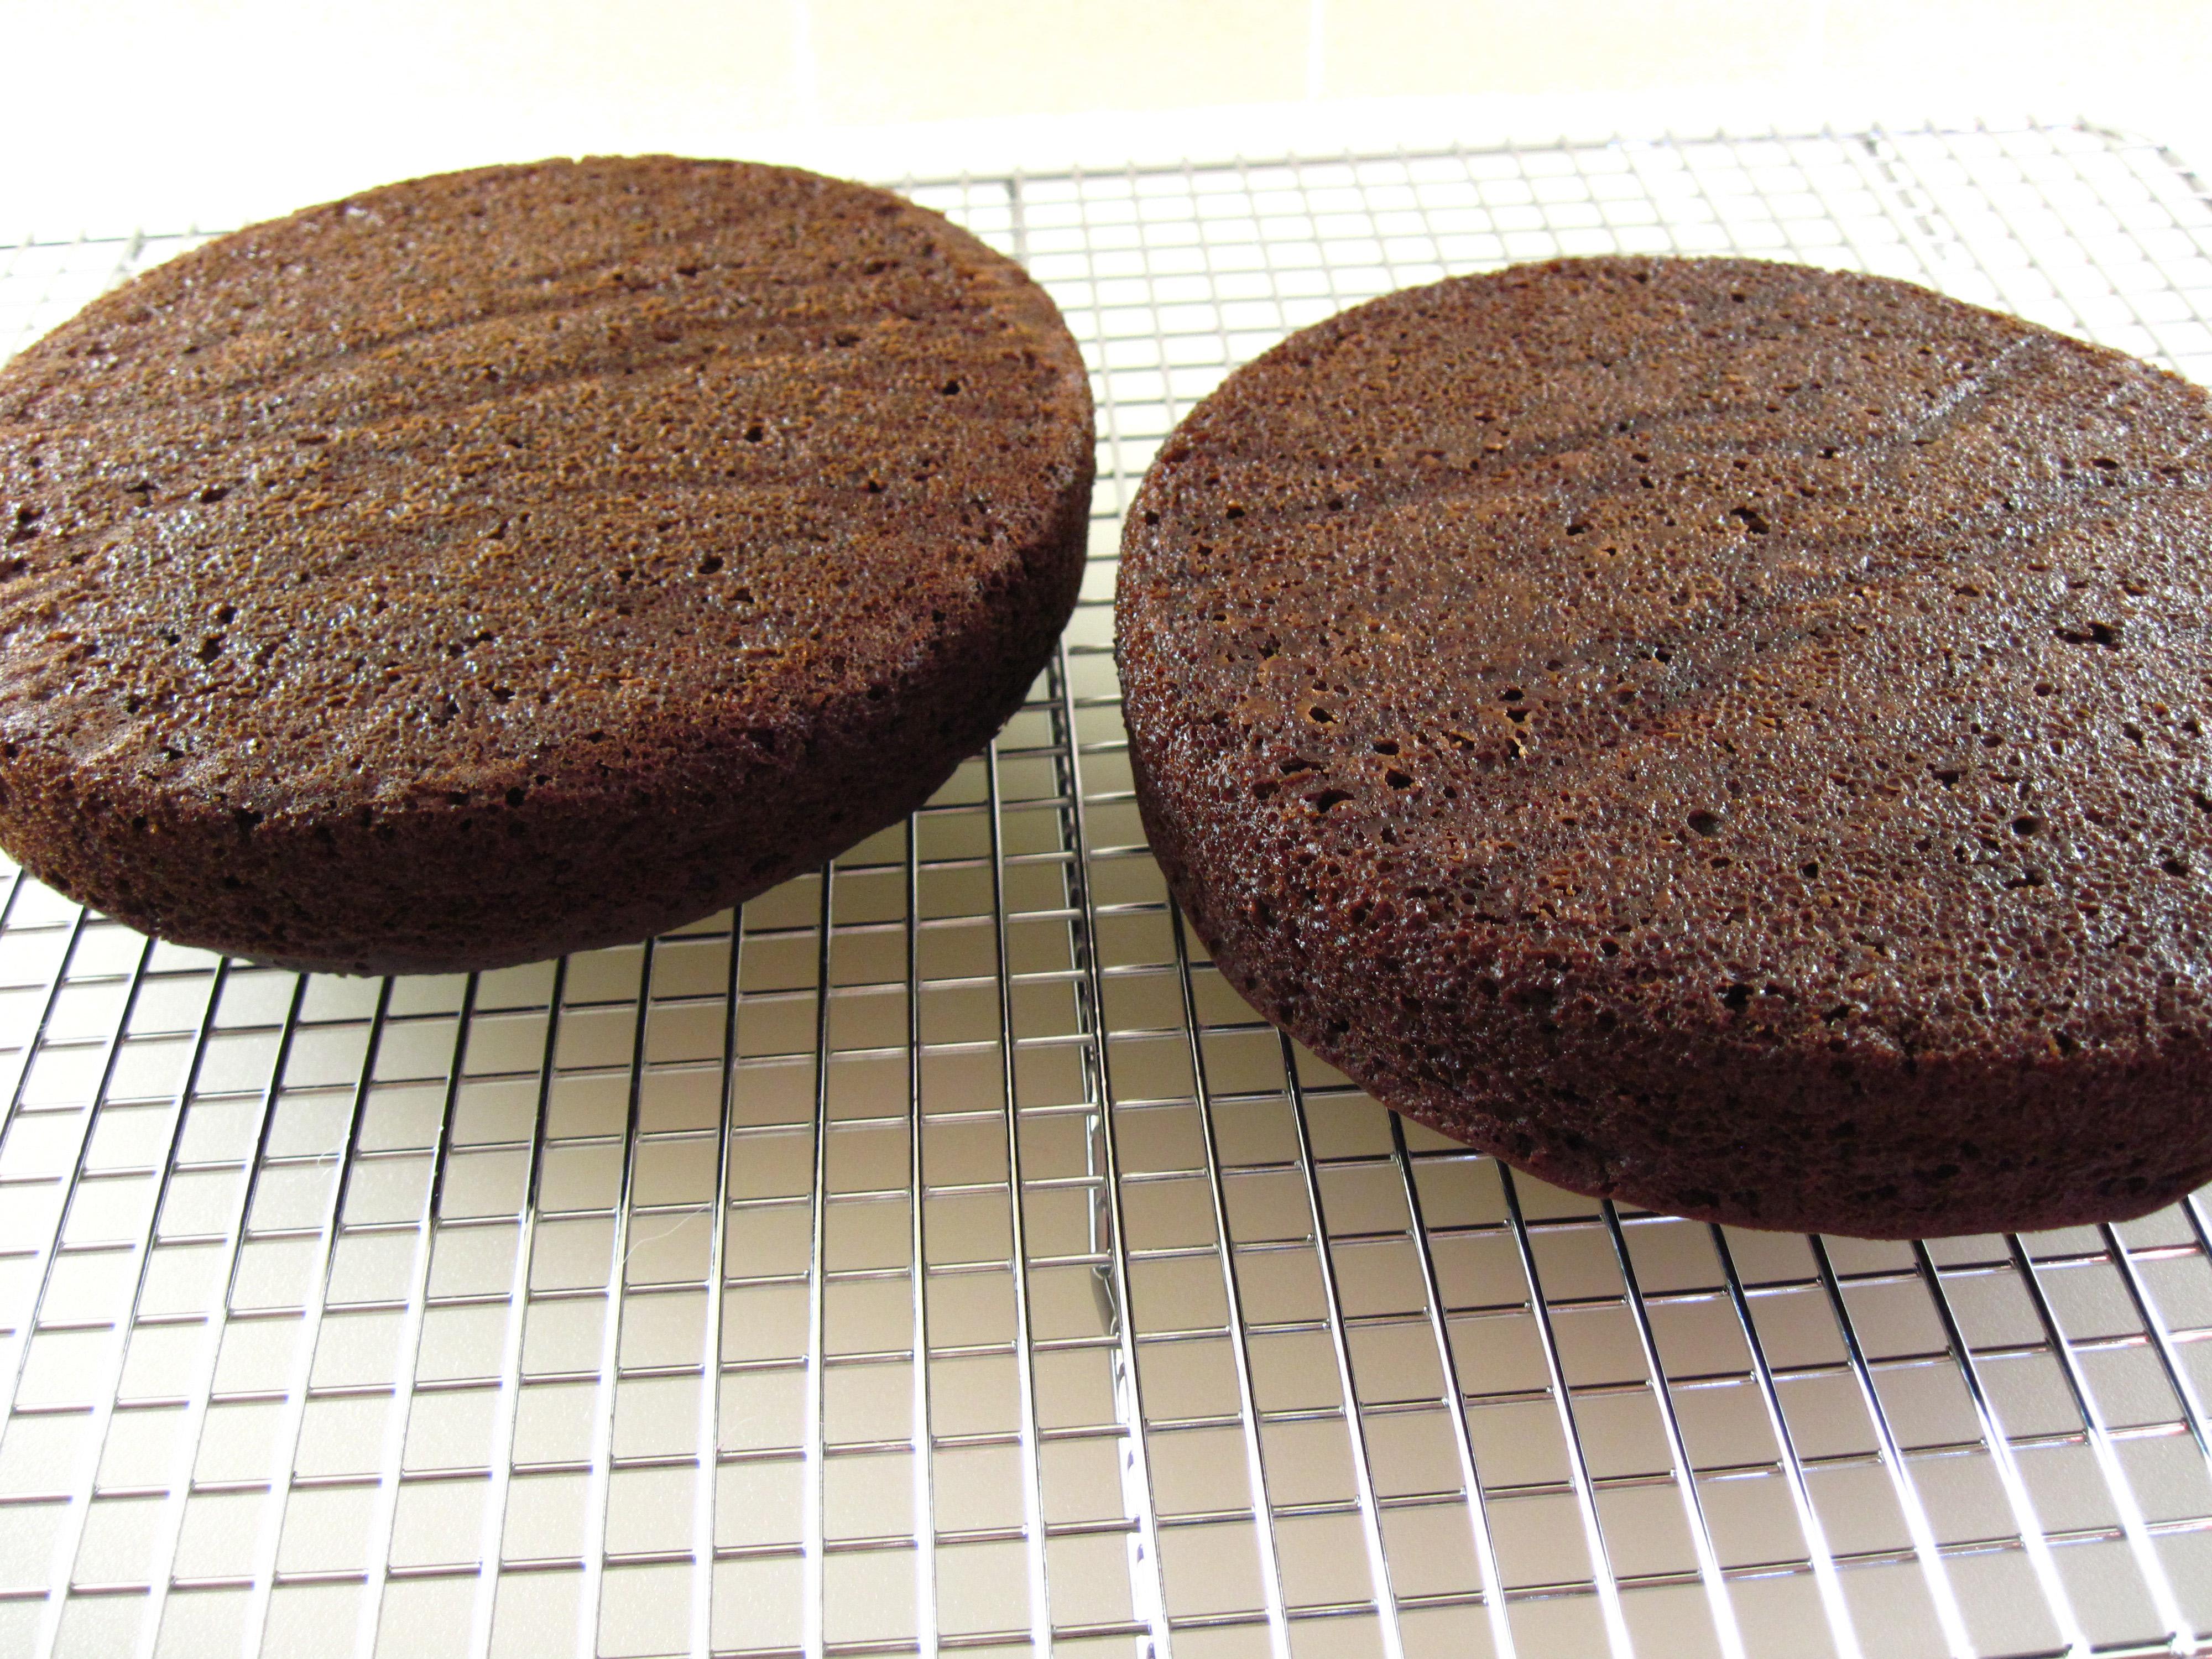 Coconut Sweetened Vegan Chocolate Cake In The Kitchen